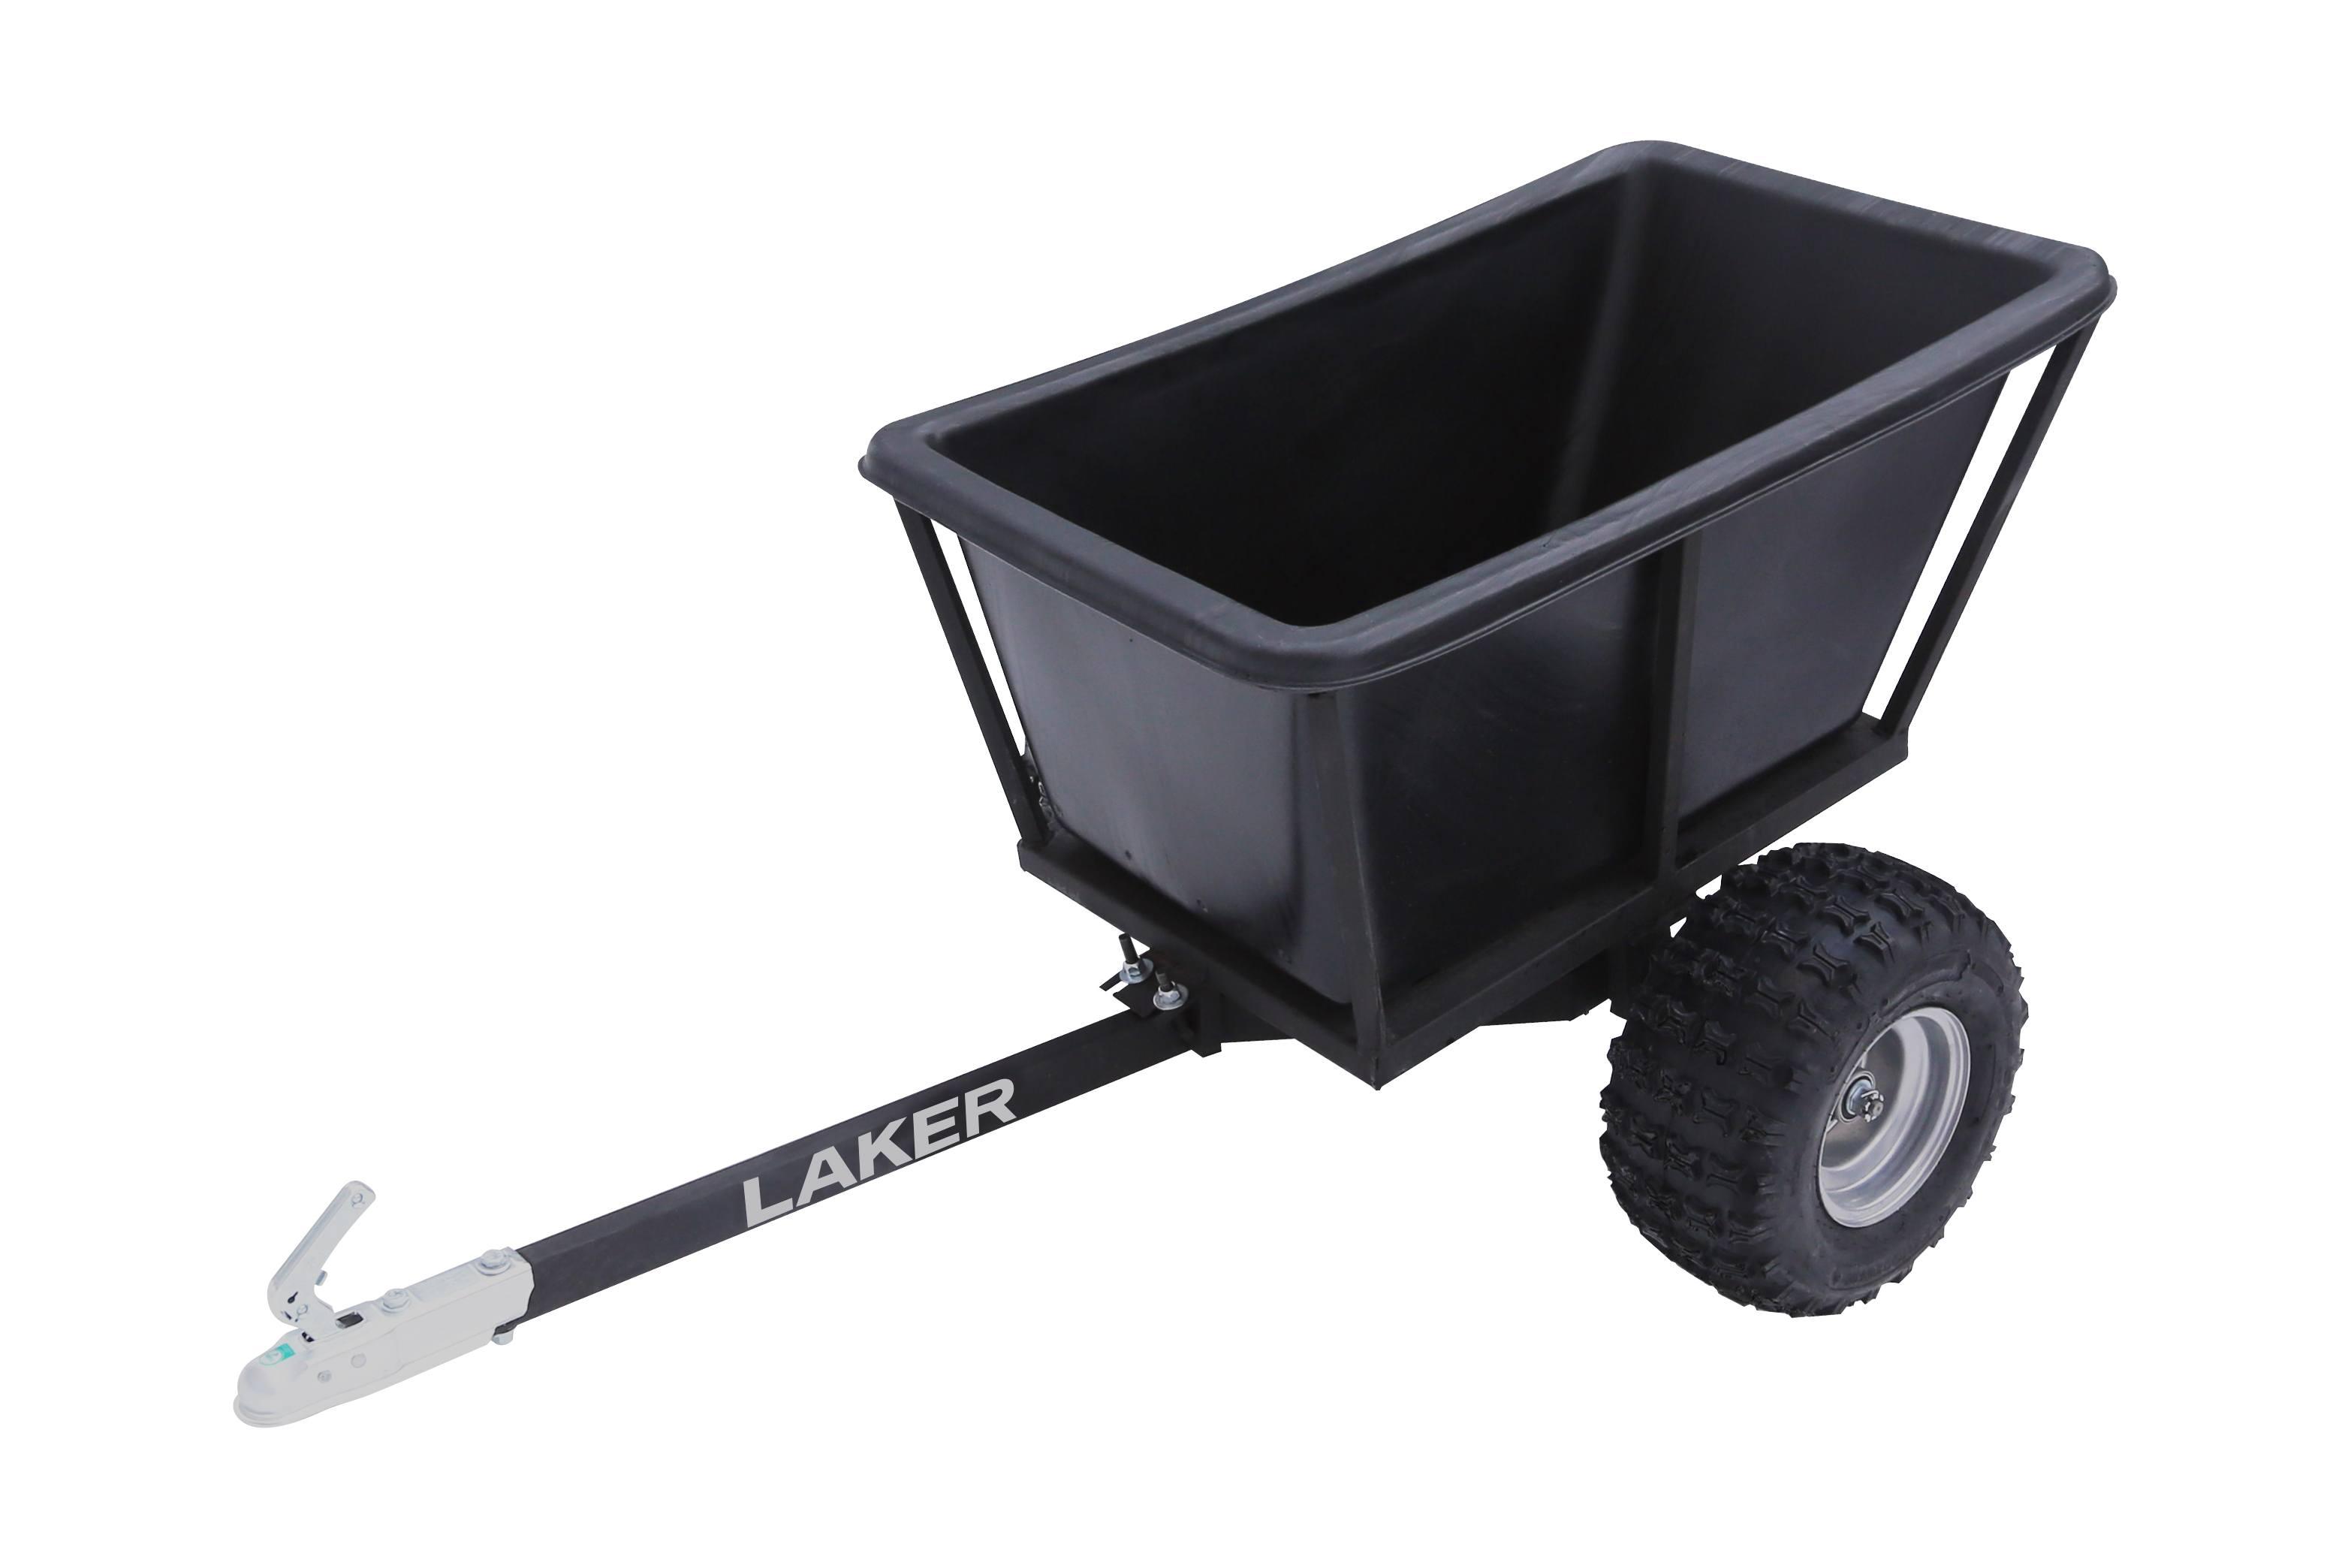 Laker для квадроциклов кузовной, усиленный